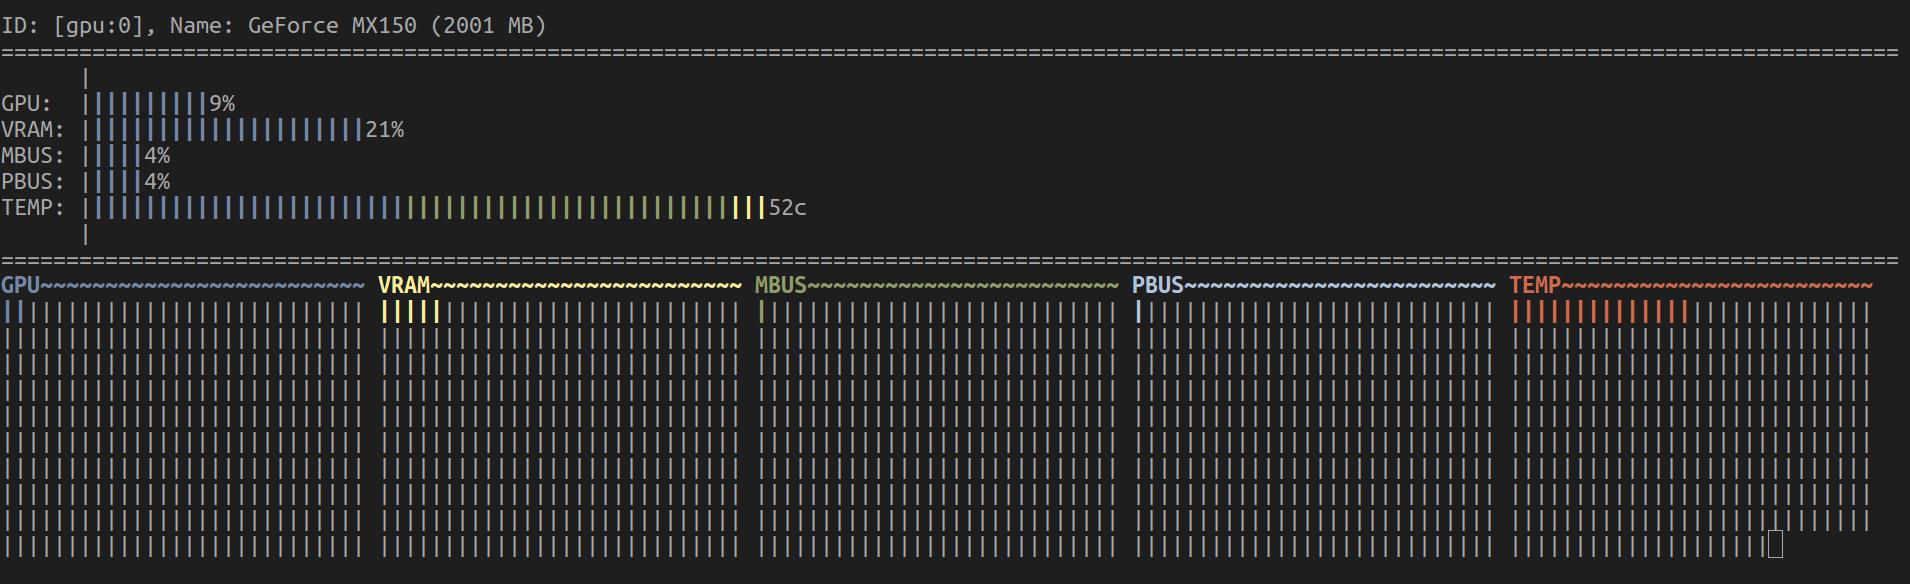 Monitoreo GPU con gmonitor